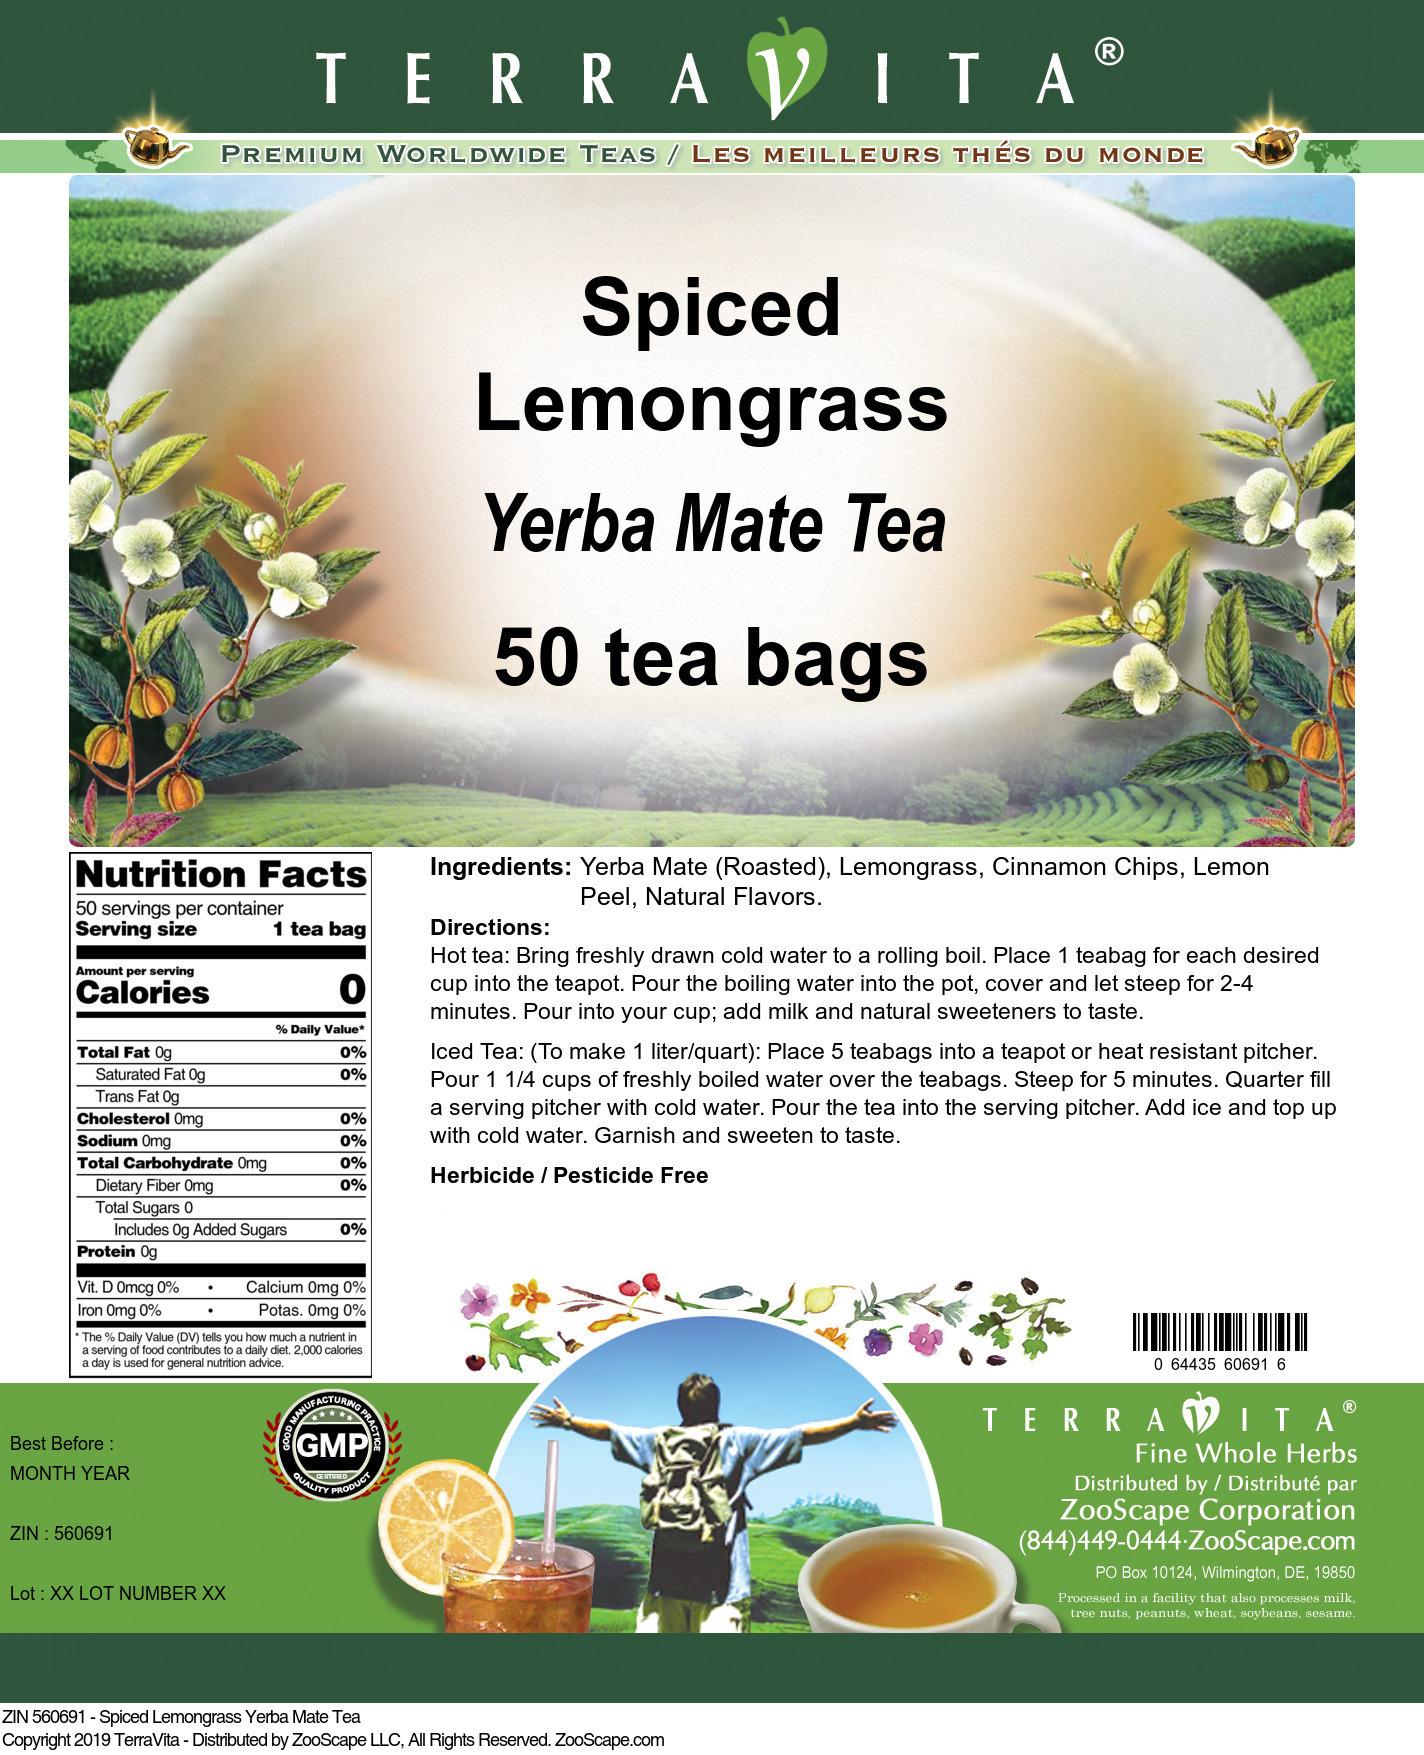 Spiced Lemongrass Yerba Mate